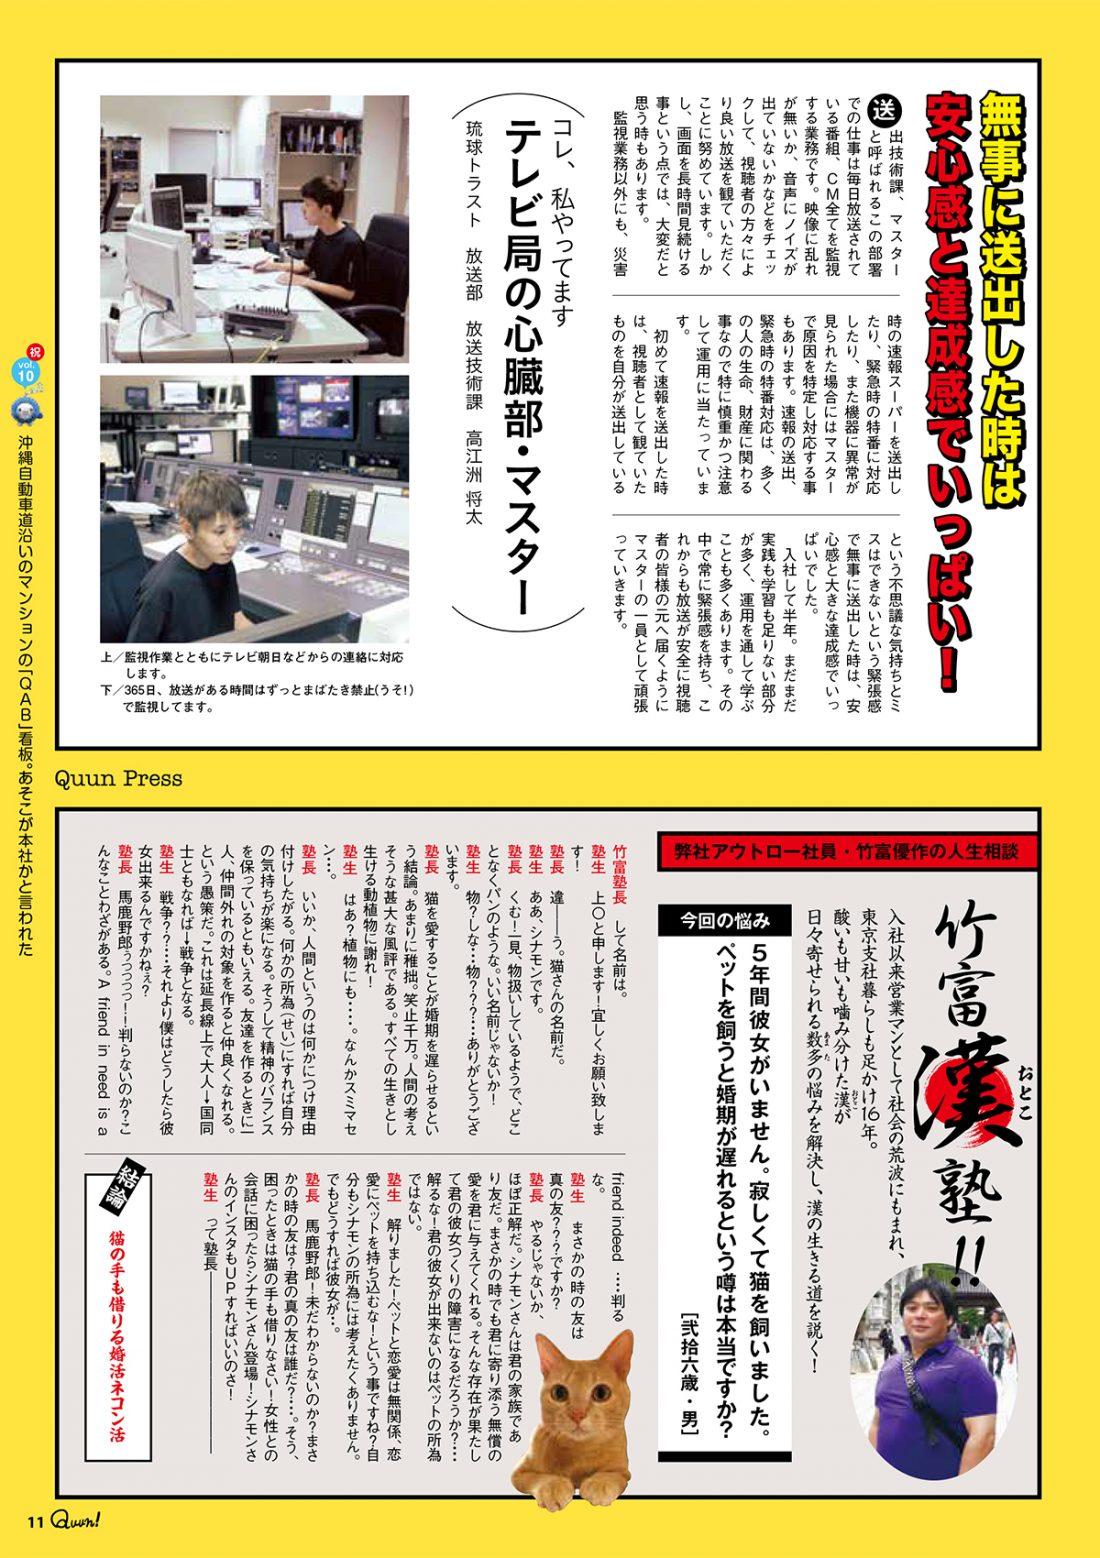 https://www.qab.co.jp/qgoro/wp-content/uploads/quun_1013-1100x1558.jpg